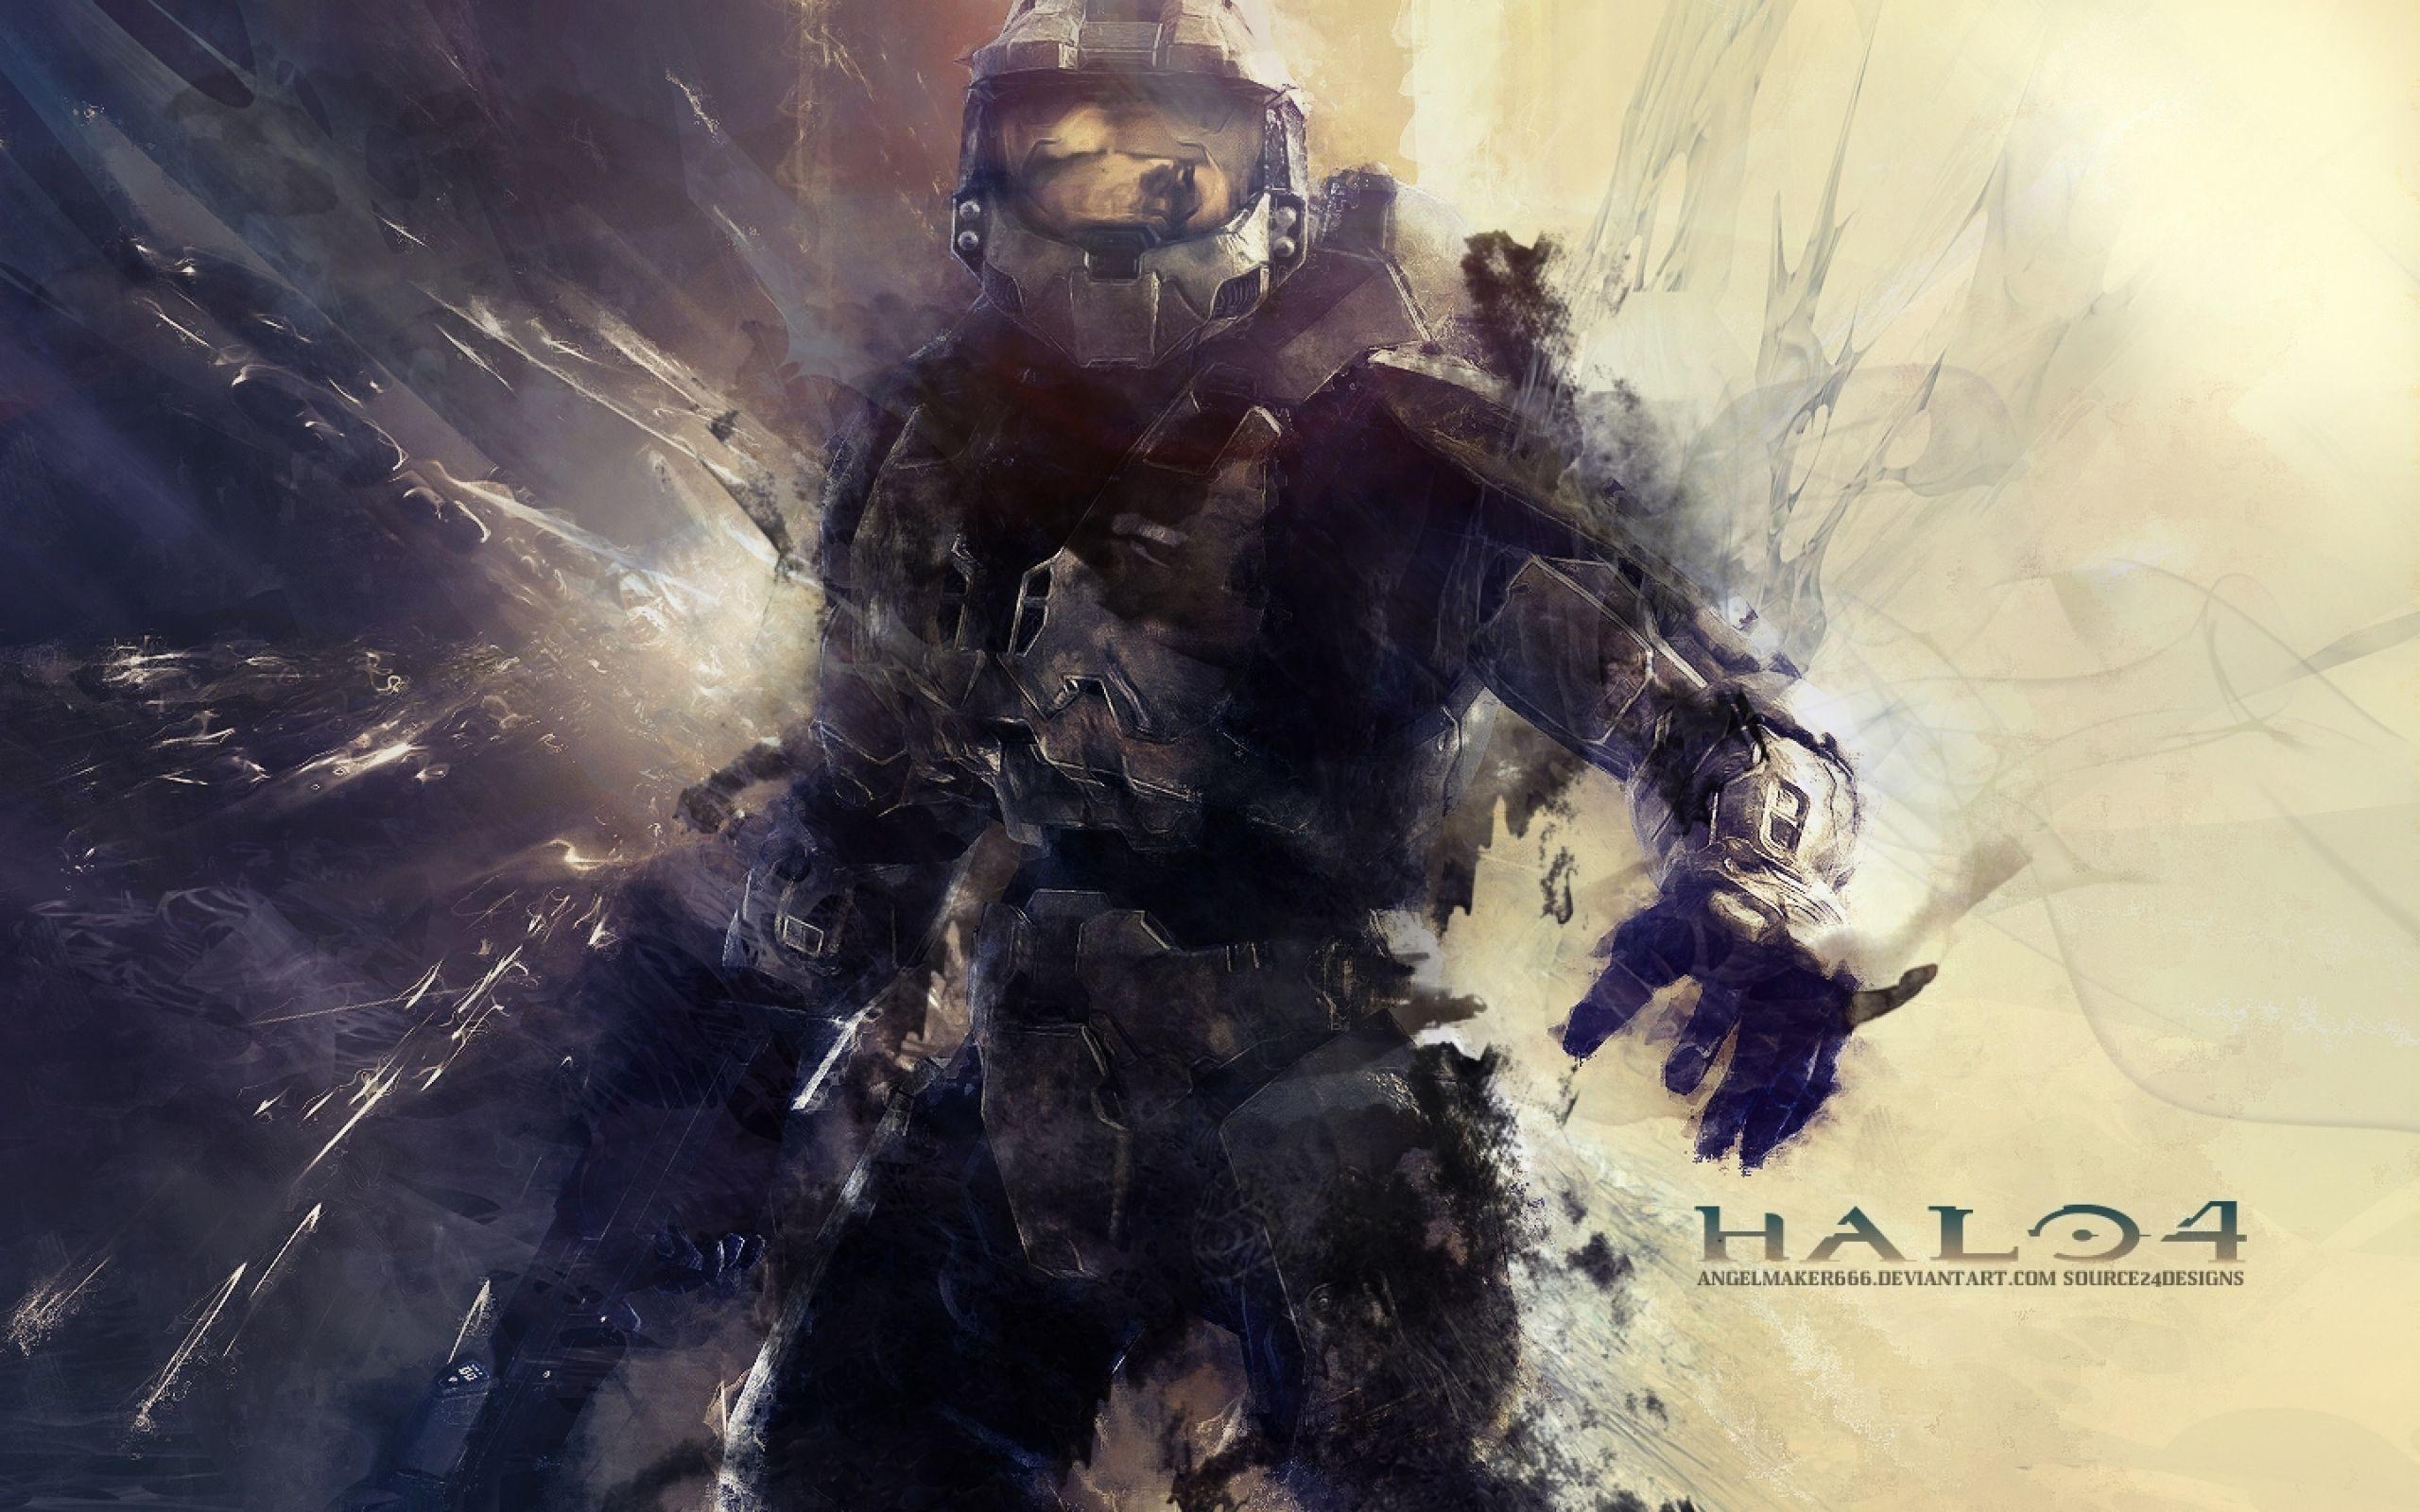 Wallpaper Halo 4